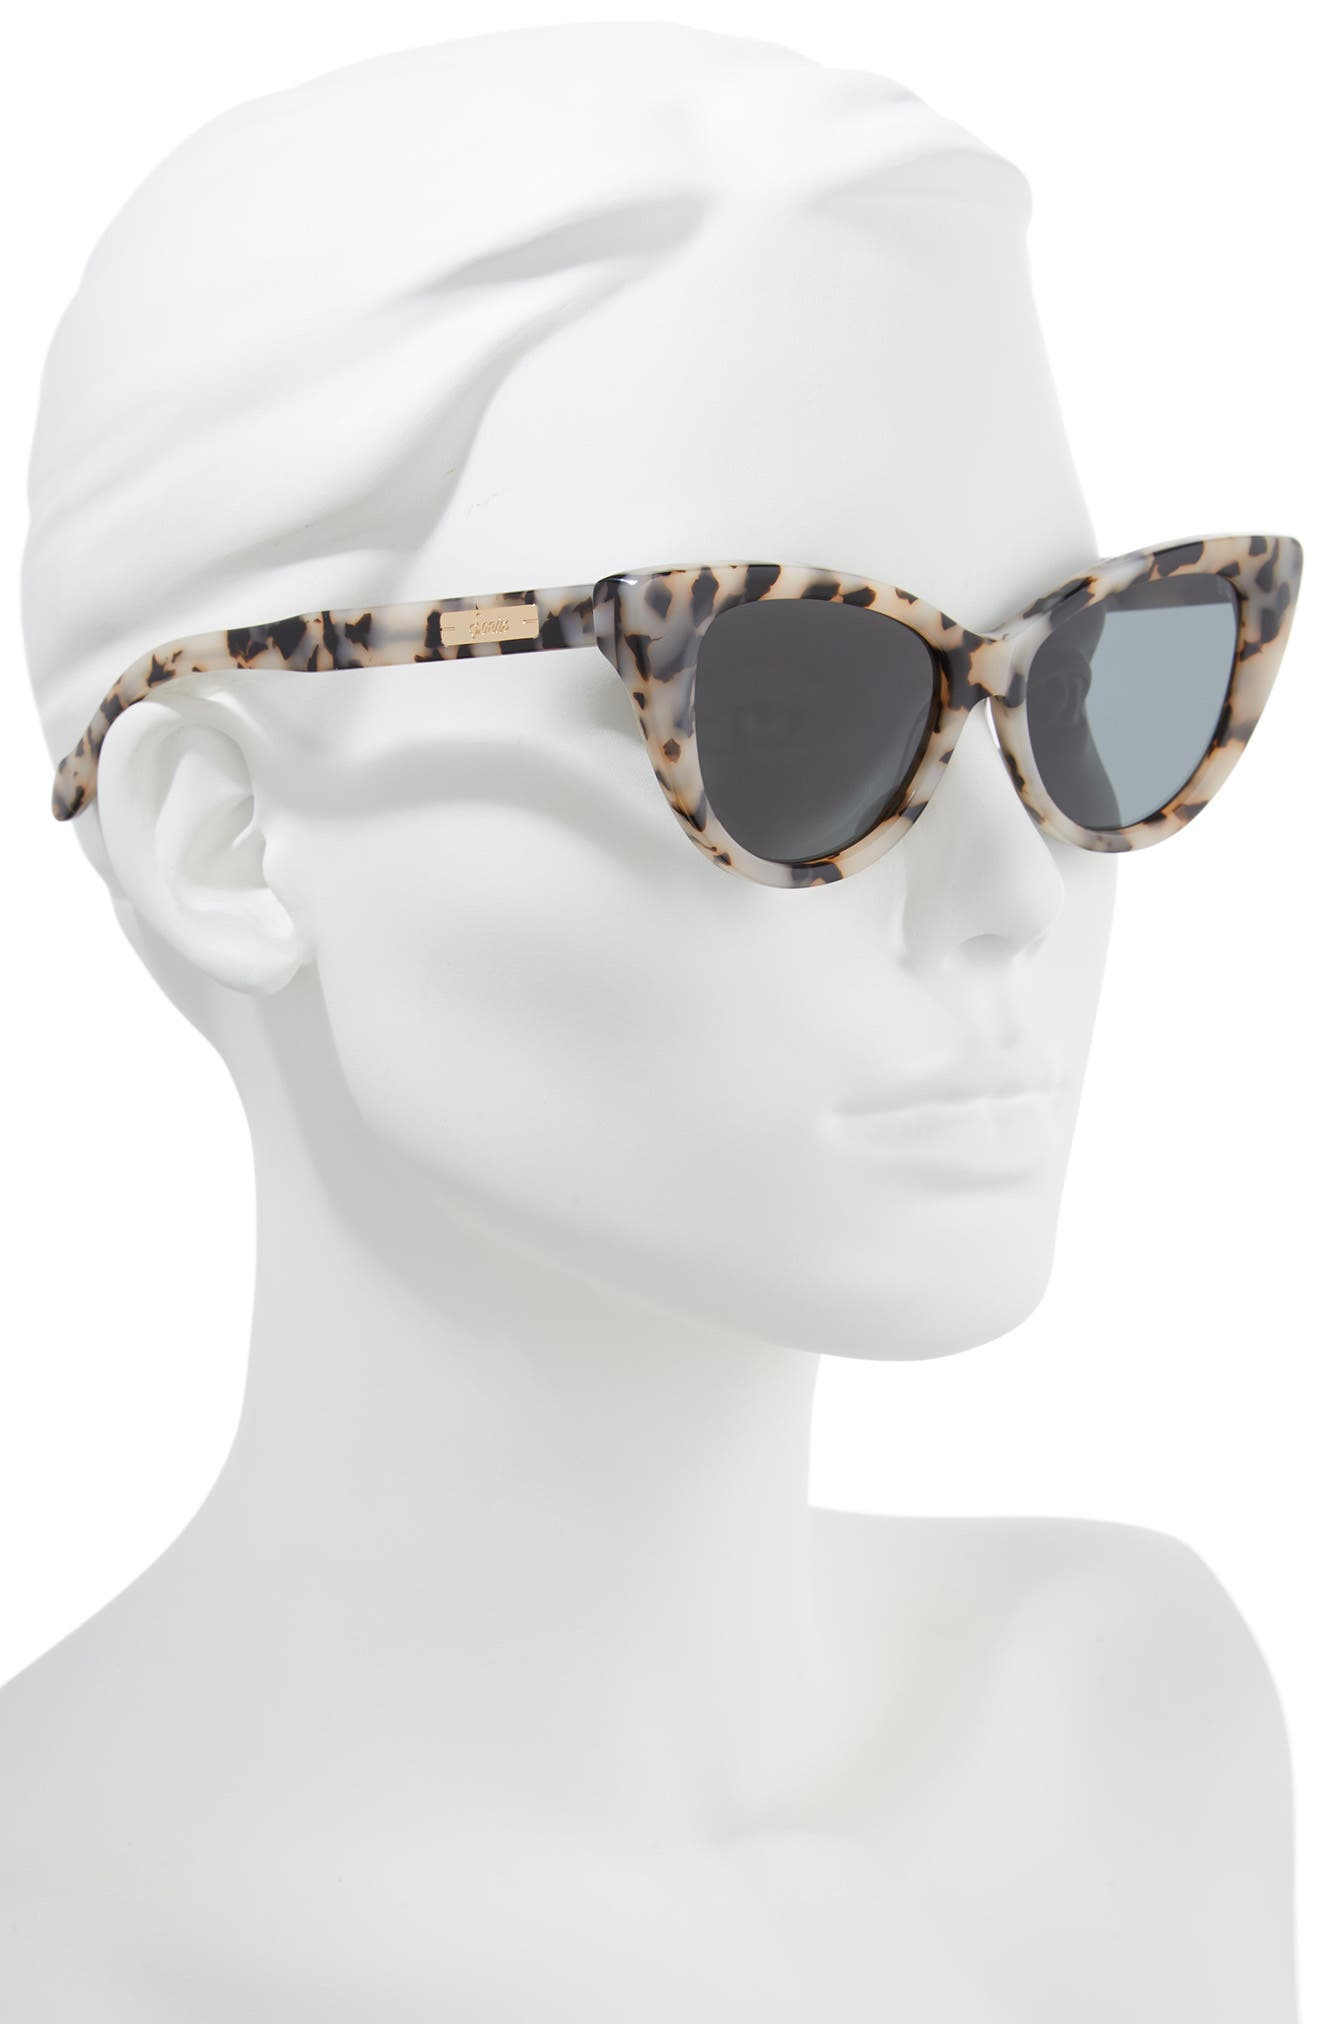 Kyoto 51mm Cat Eye Sunglasses,                             Alternate thumbnail 2, color,                             Milk Tortoise/ Black Solid